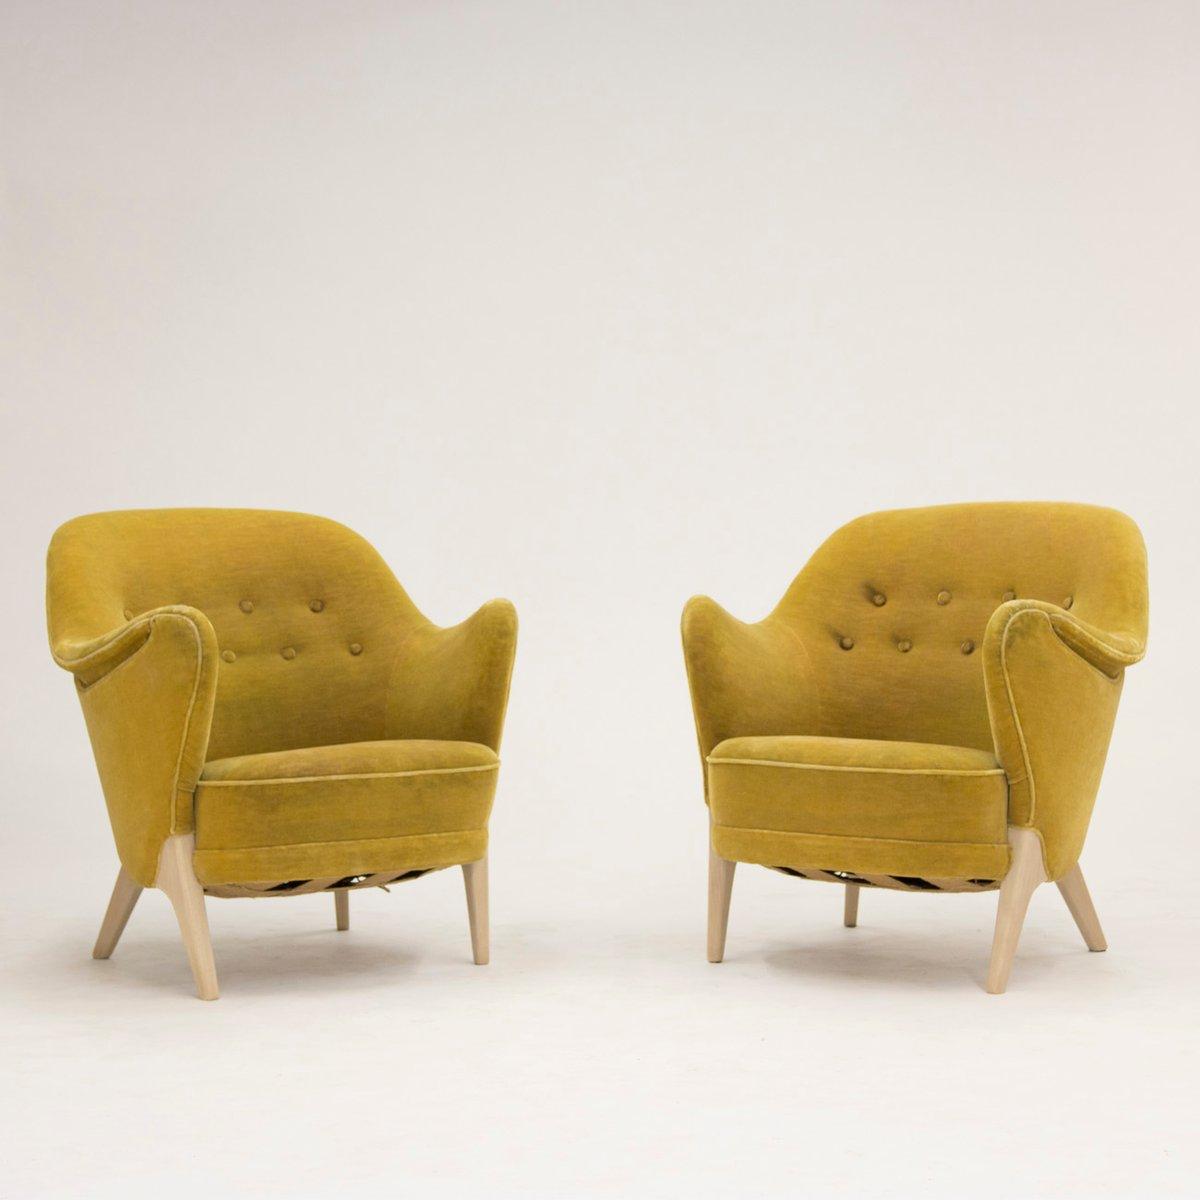 d nische lounge st hle von arne hovmand olsen 1950er 2er set bei pamono kaufen. Black Bedroom Furniture Sets. Home Design Ideas